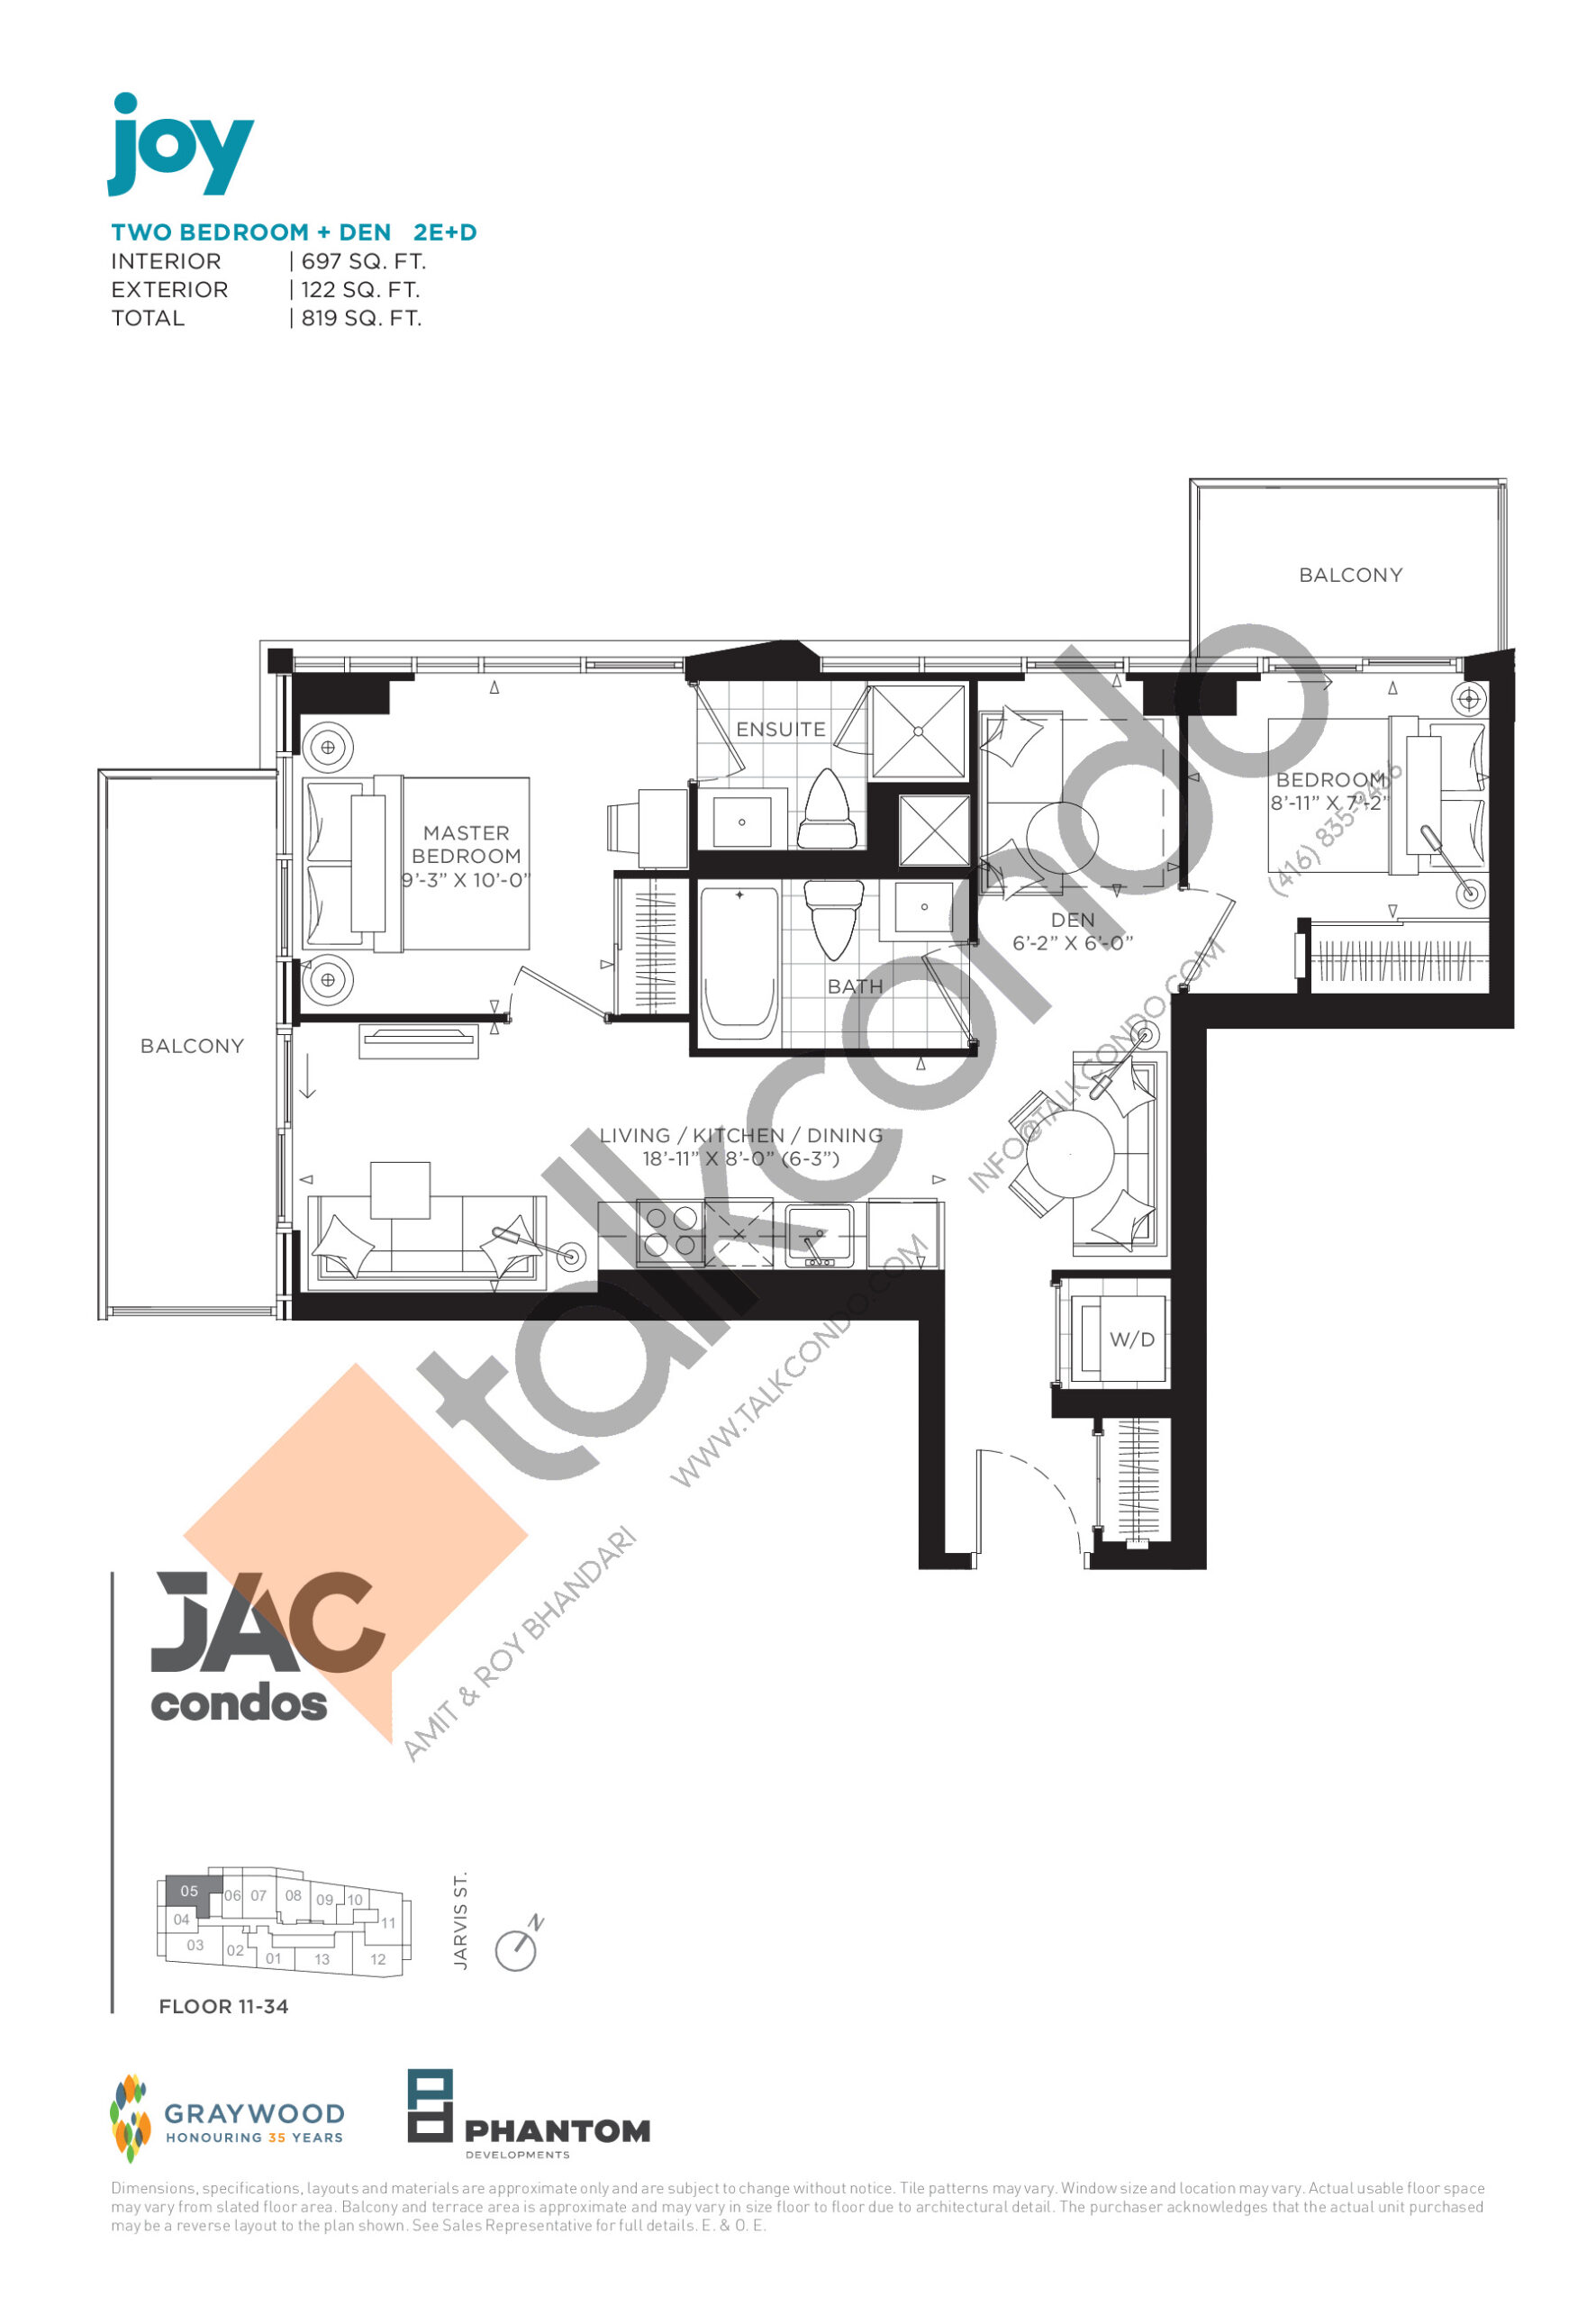 Joy Floor Plan at JAC Condos - 697 sq.ft